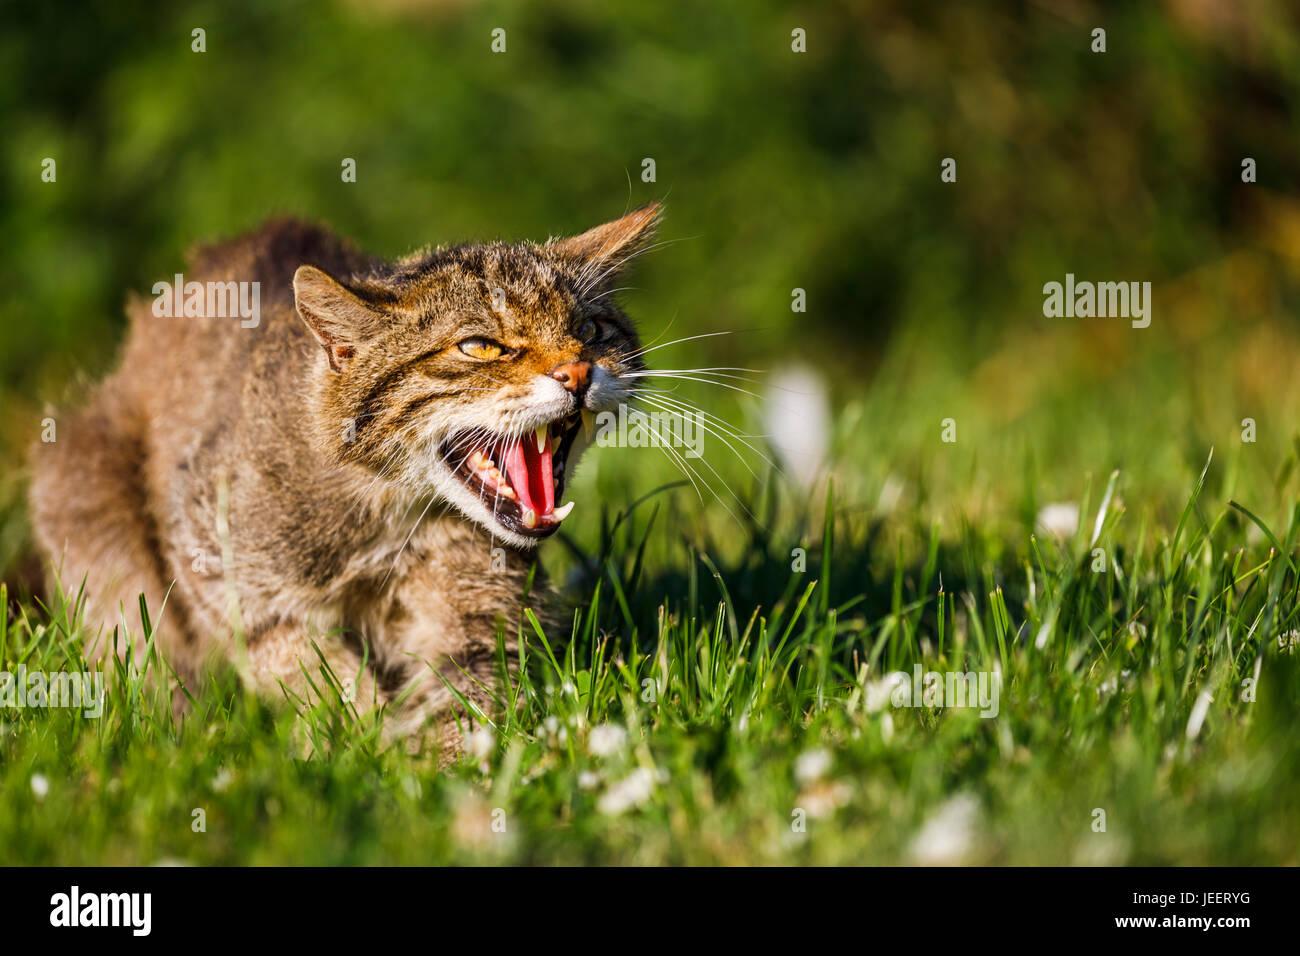 Native British wildlife: Scottish Wildcat (Felis silvestris) snarls showing its sharp teeth, British Wildlife Centre, - Stock Image